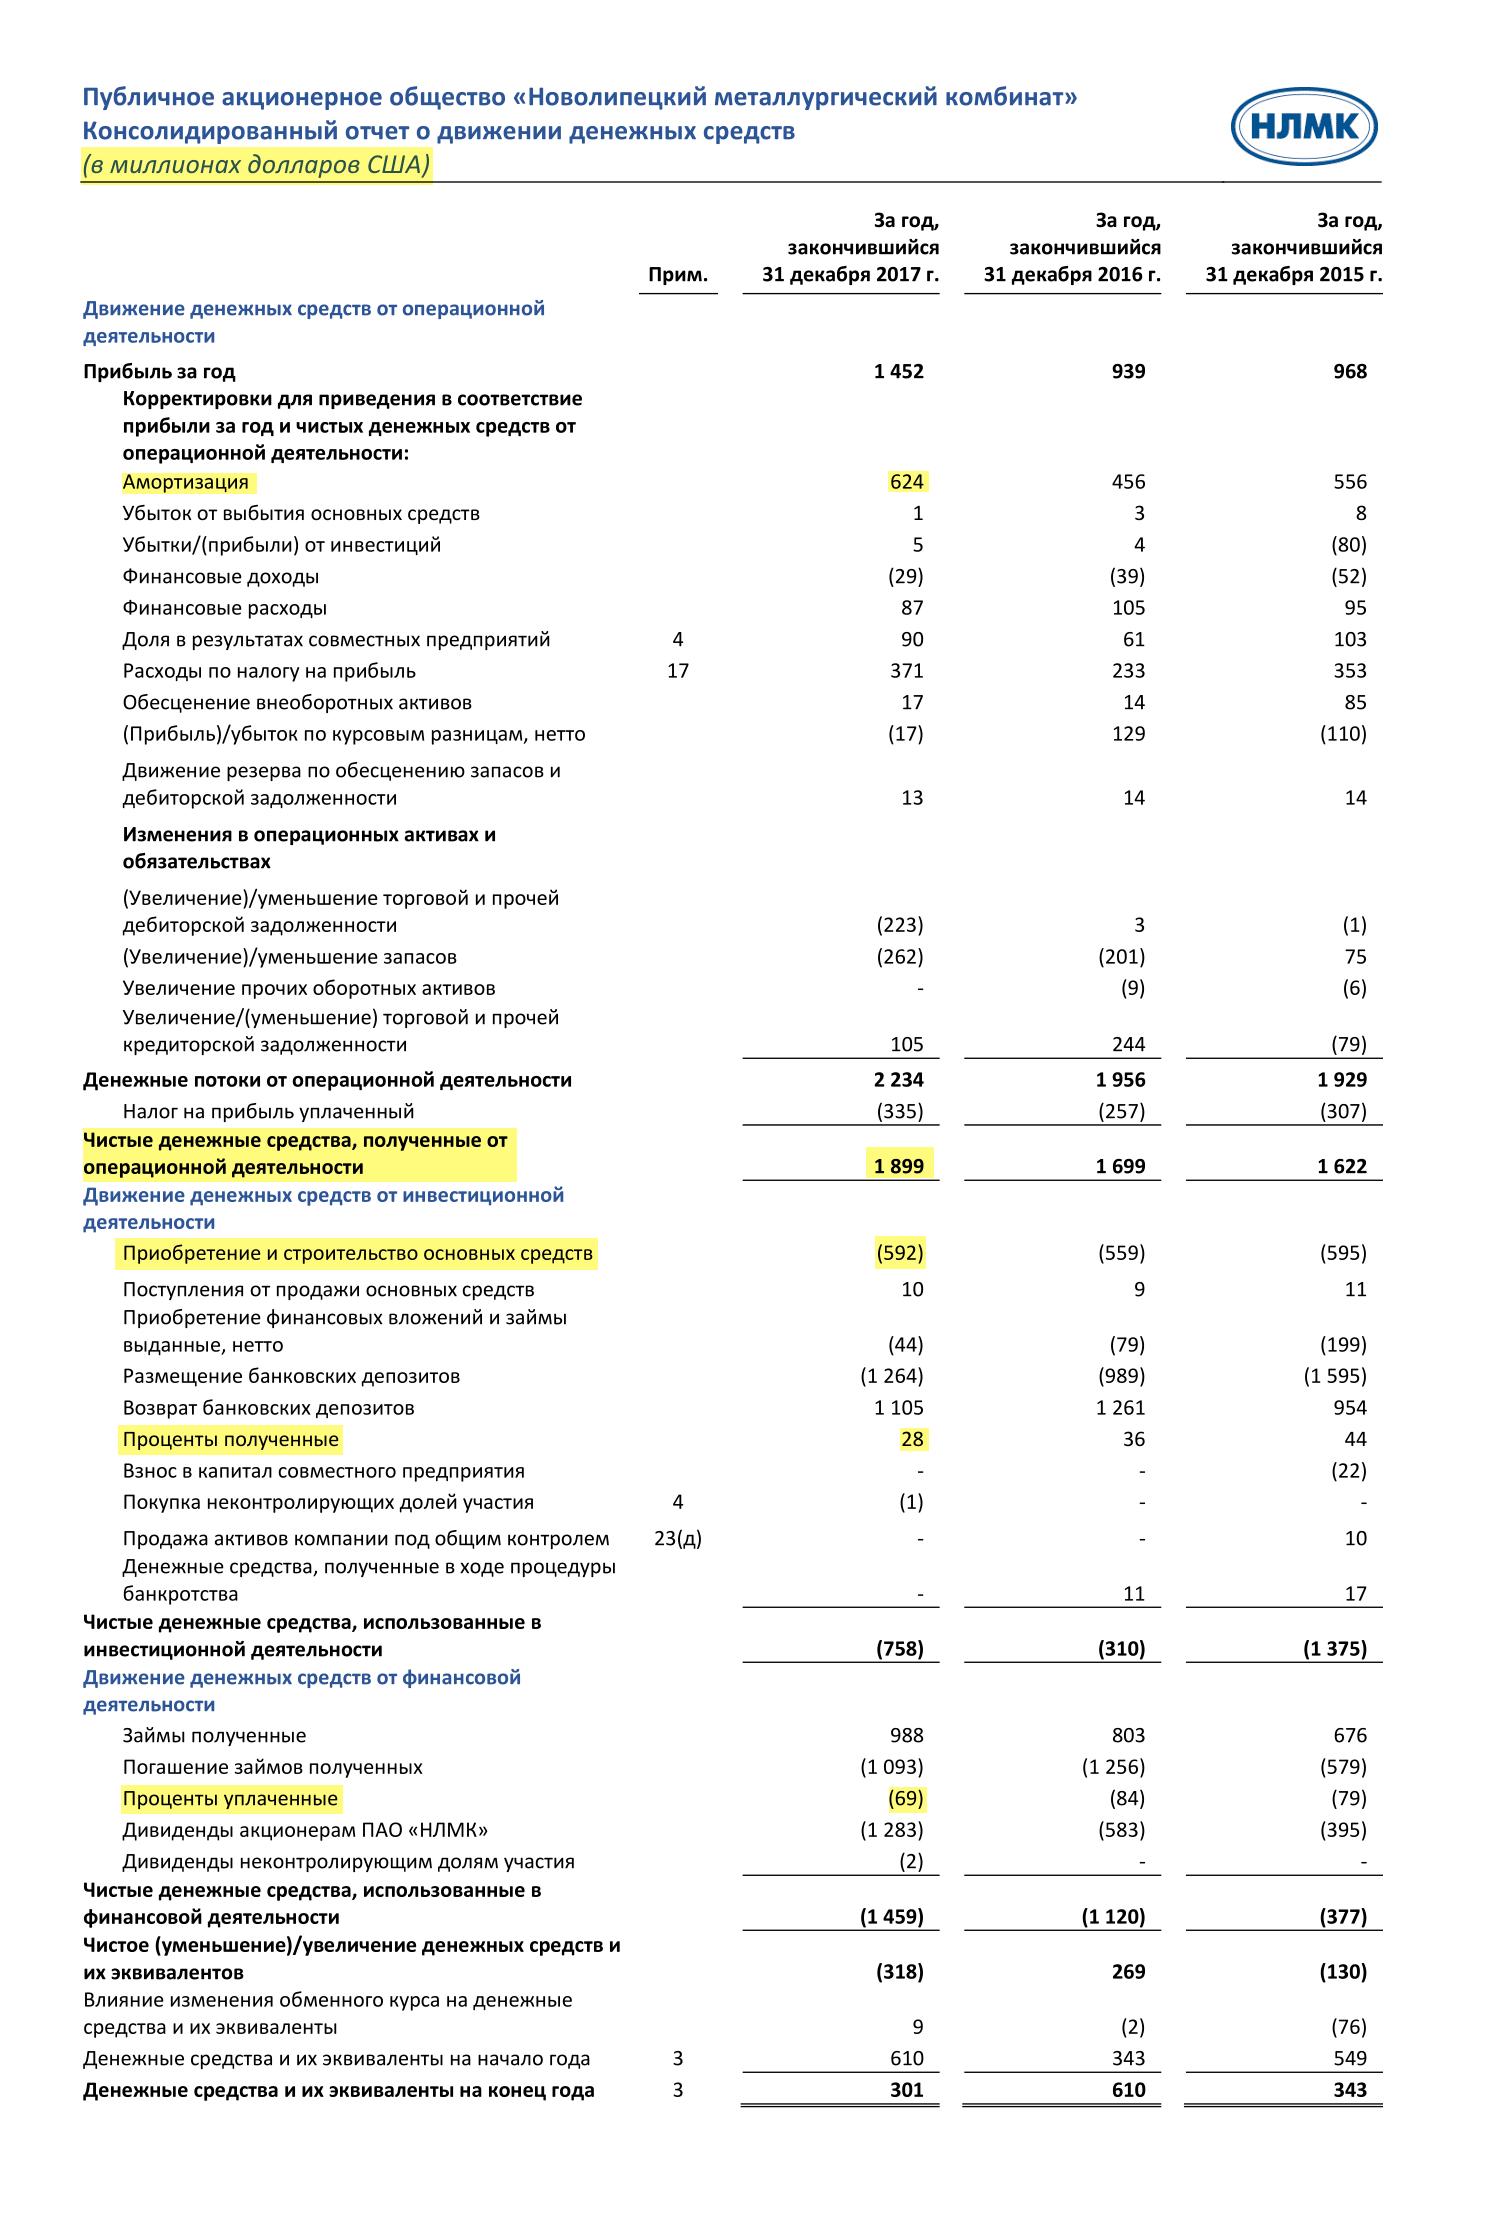 Страница 17 отчета НЛМК по итогам 2017 года